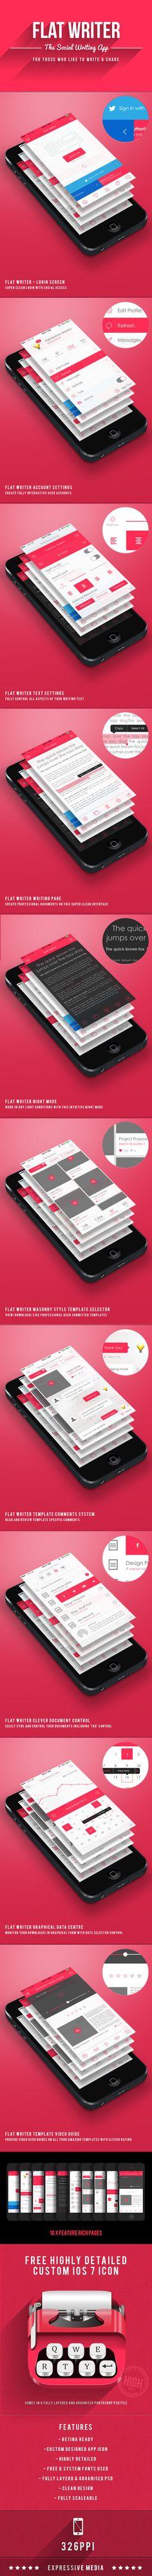 Flat Writer by Expressive Media, via Behance #impressive #appDesign #ui #ux #flat